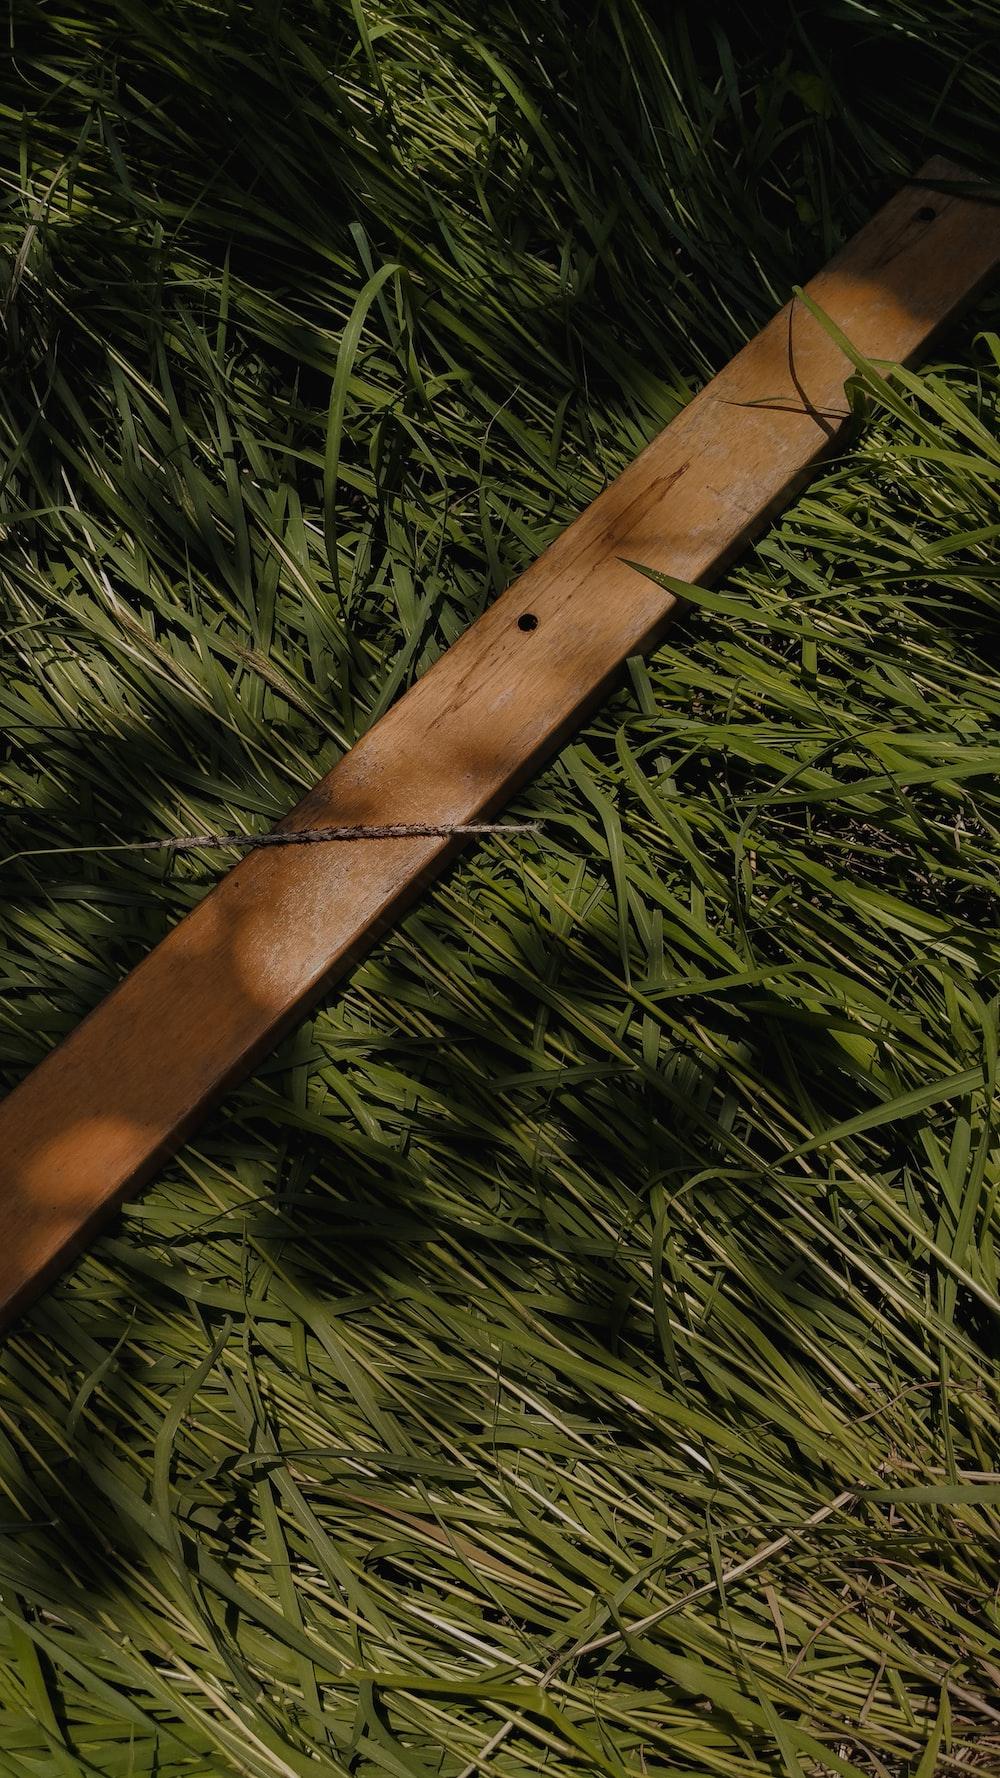 brown stick on green grass